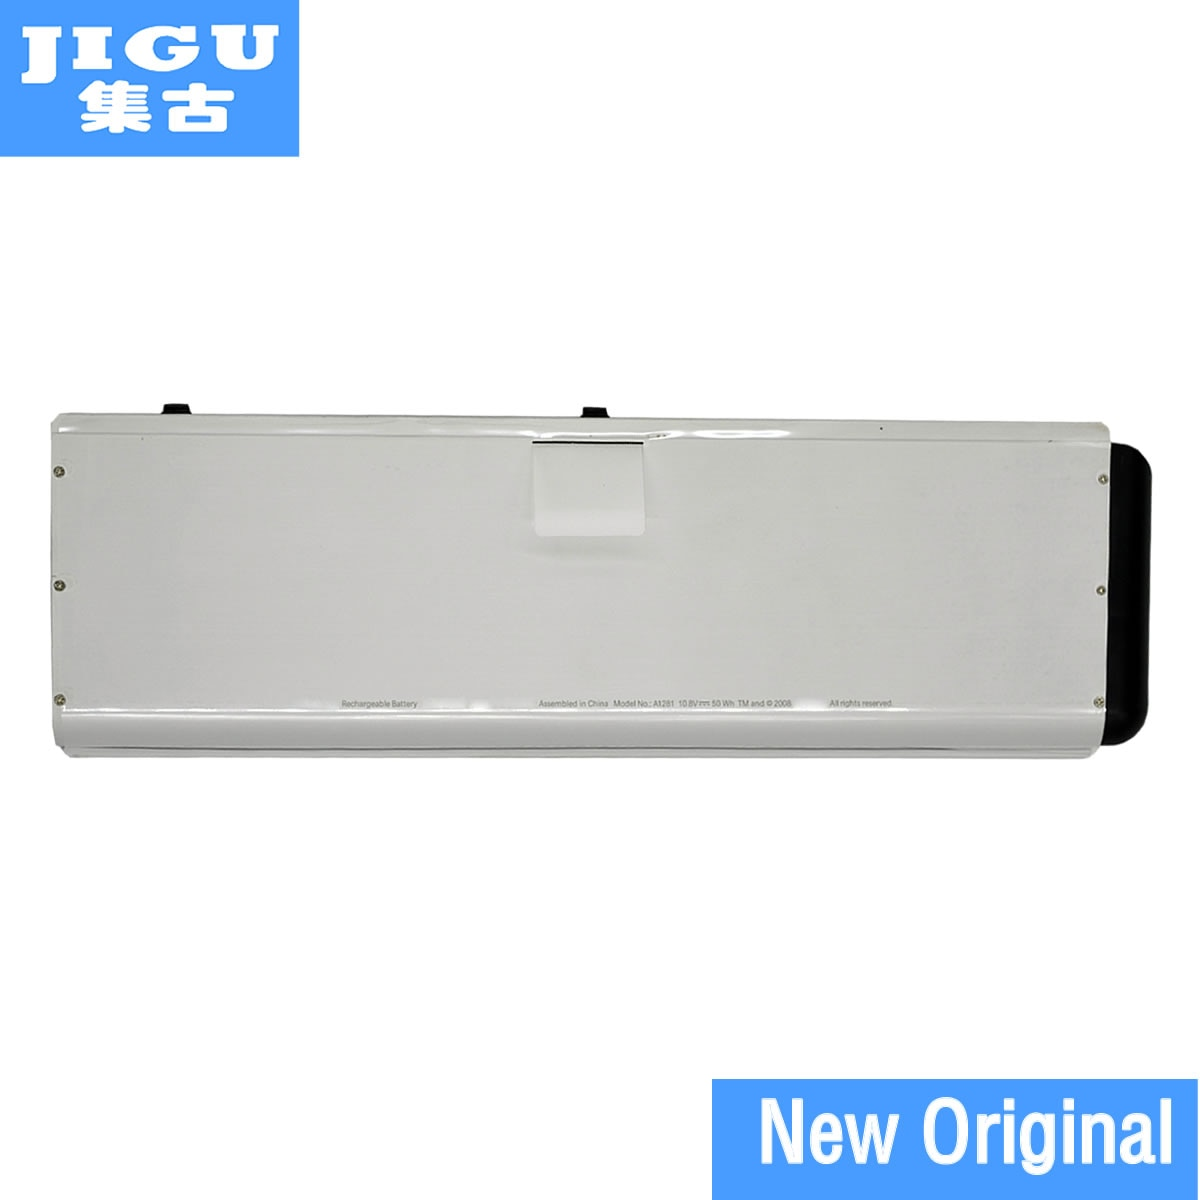 JIGU A1281 A1286 MB772 Original Laptop Battery For APPLE MacBook 15 Inch Unibody (2008 Version) MB470